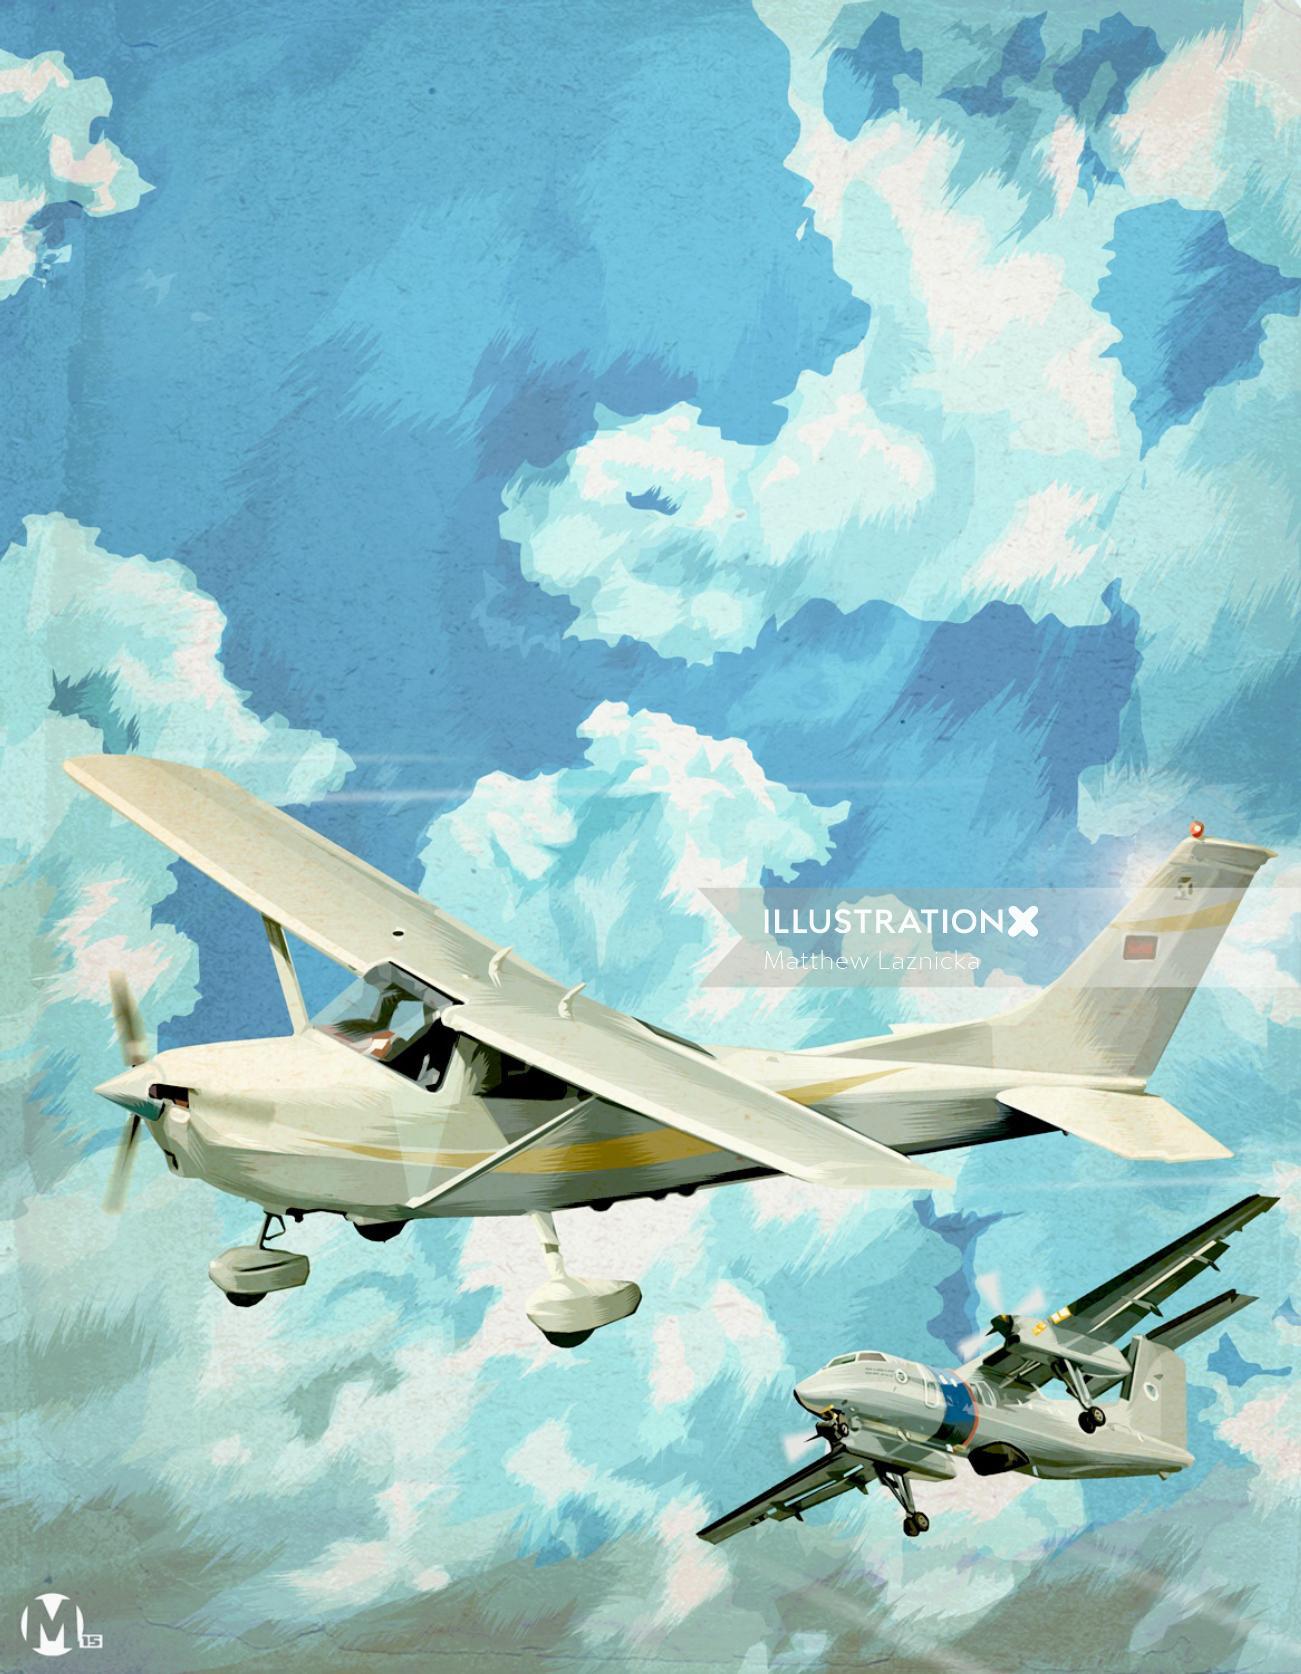 Illustration of glider planes